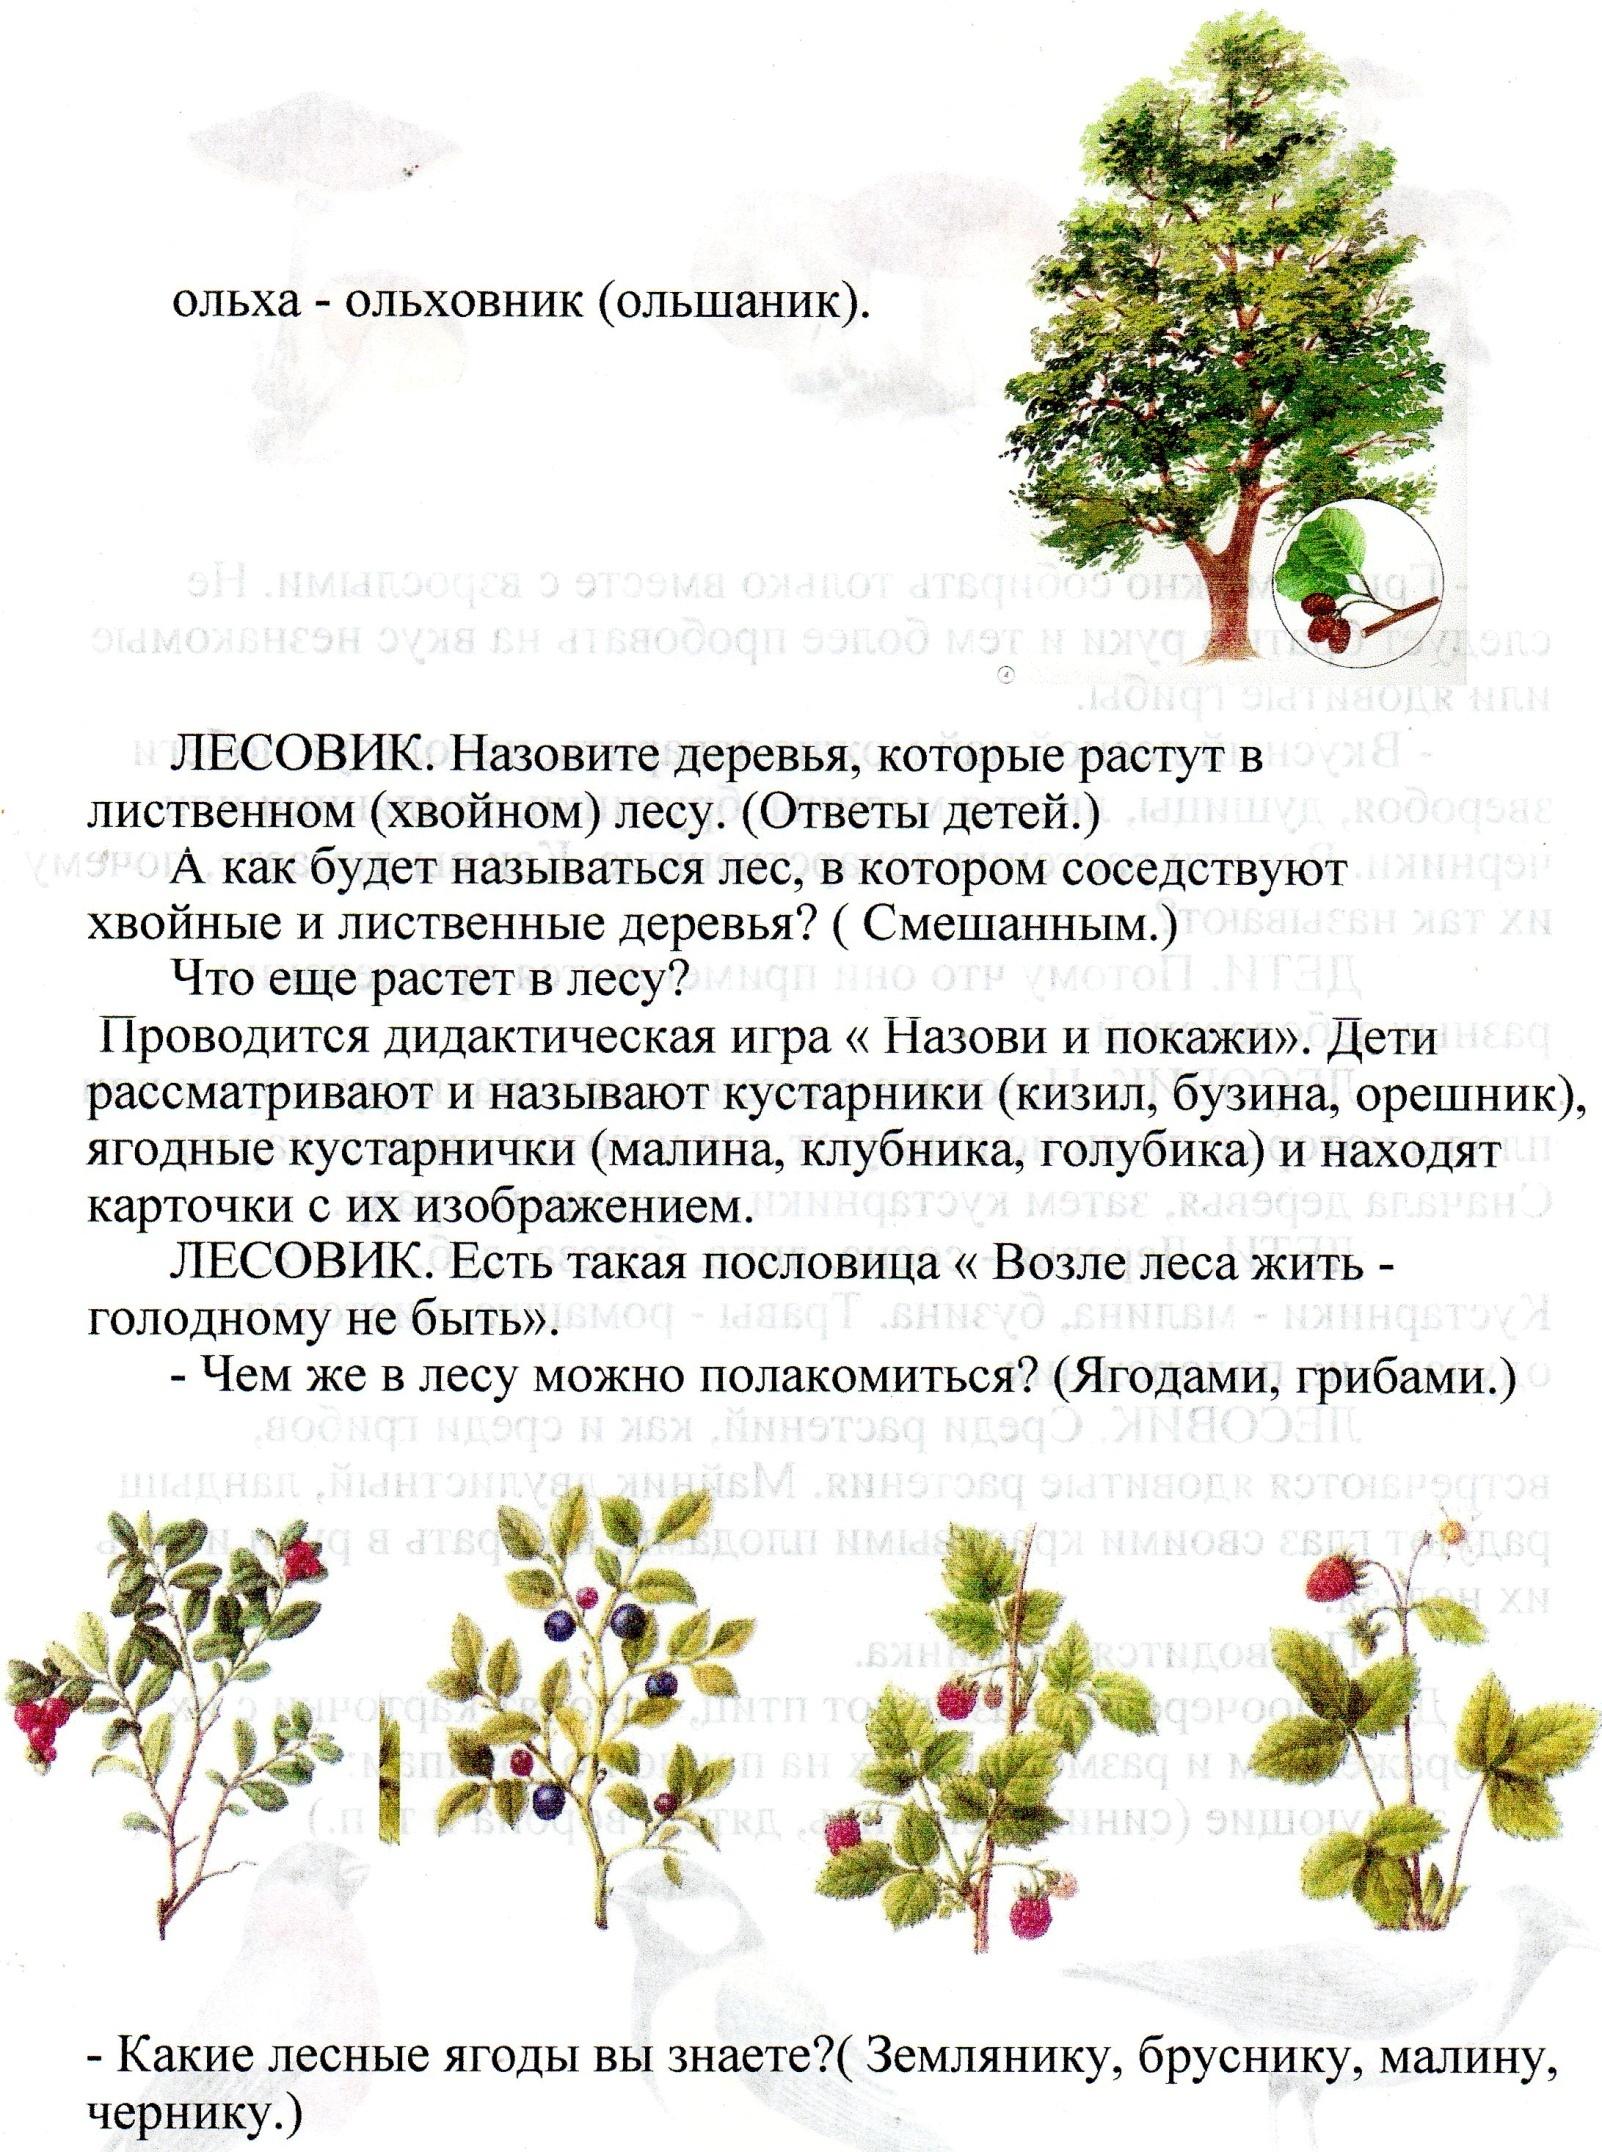 C:\Users\Александр\Pictures\img029.jpg